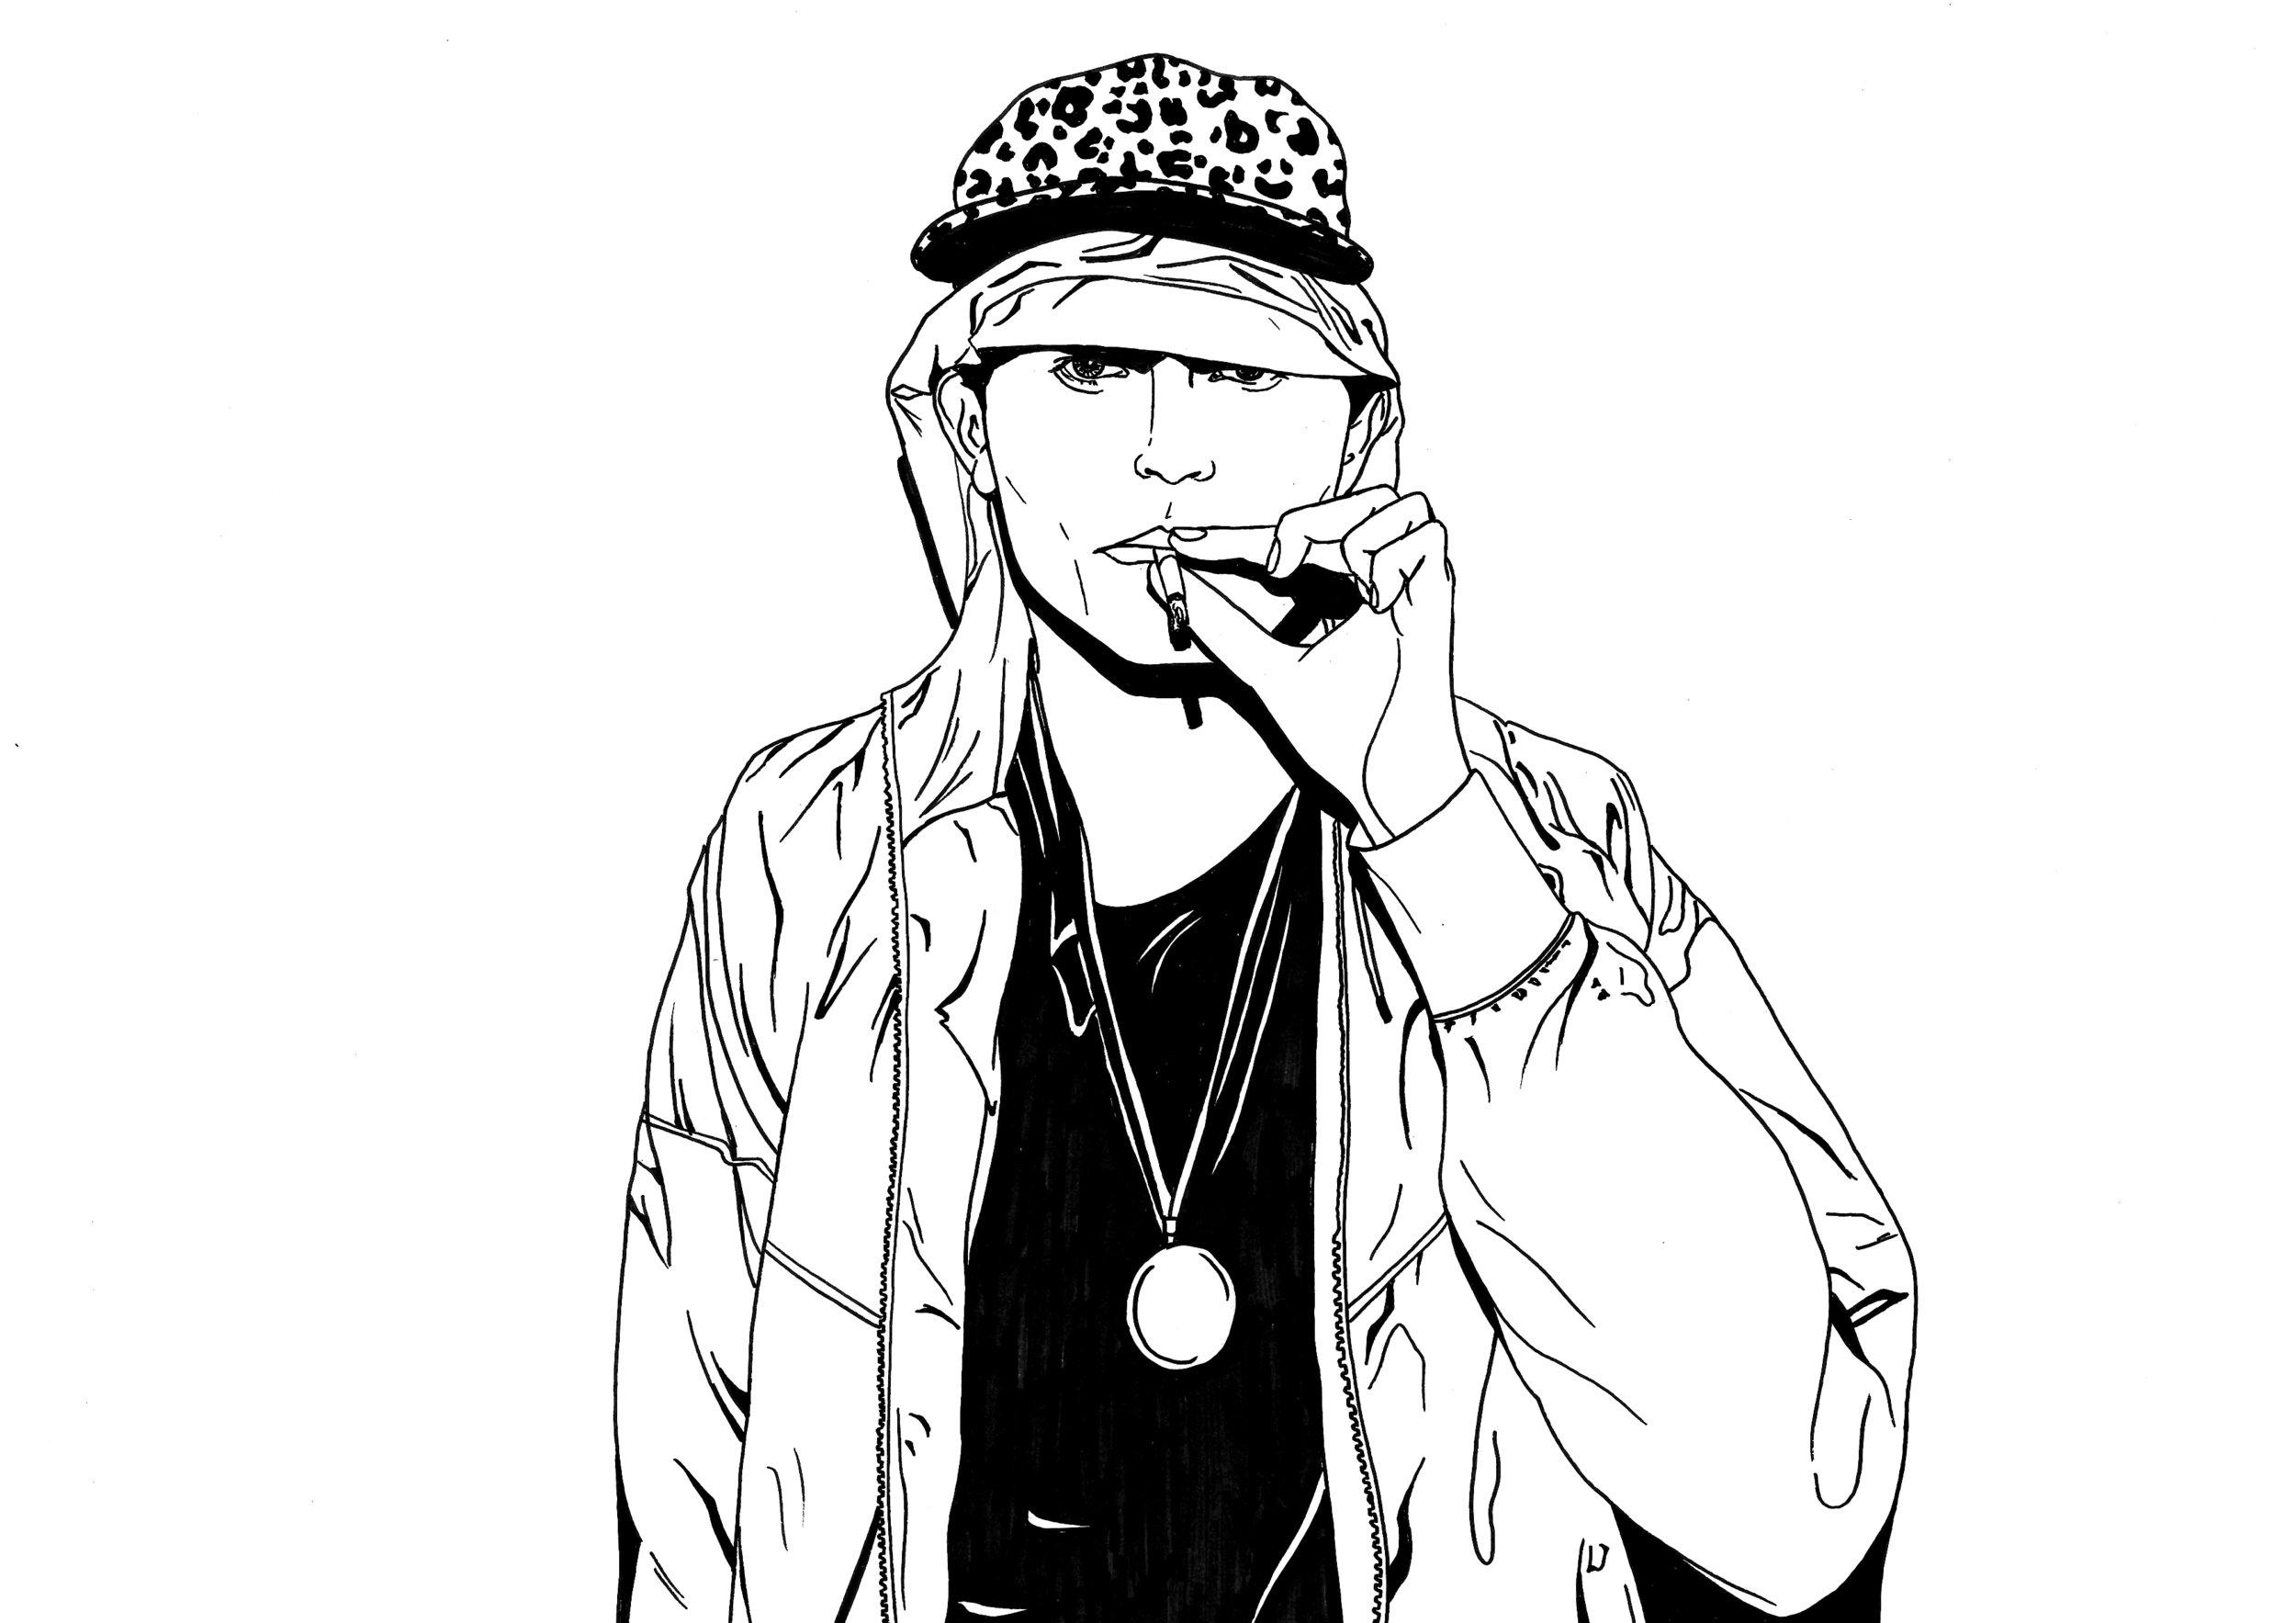 D.  Illustration